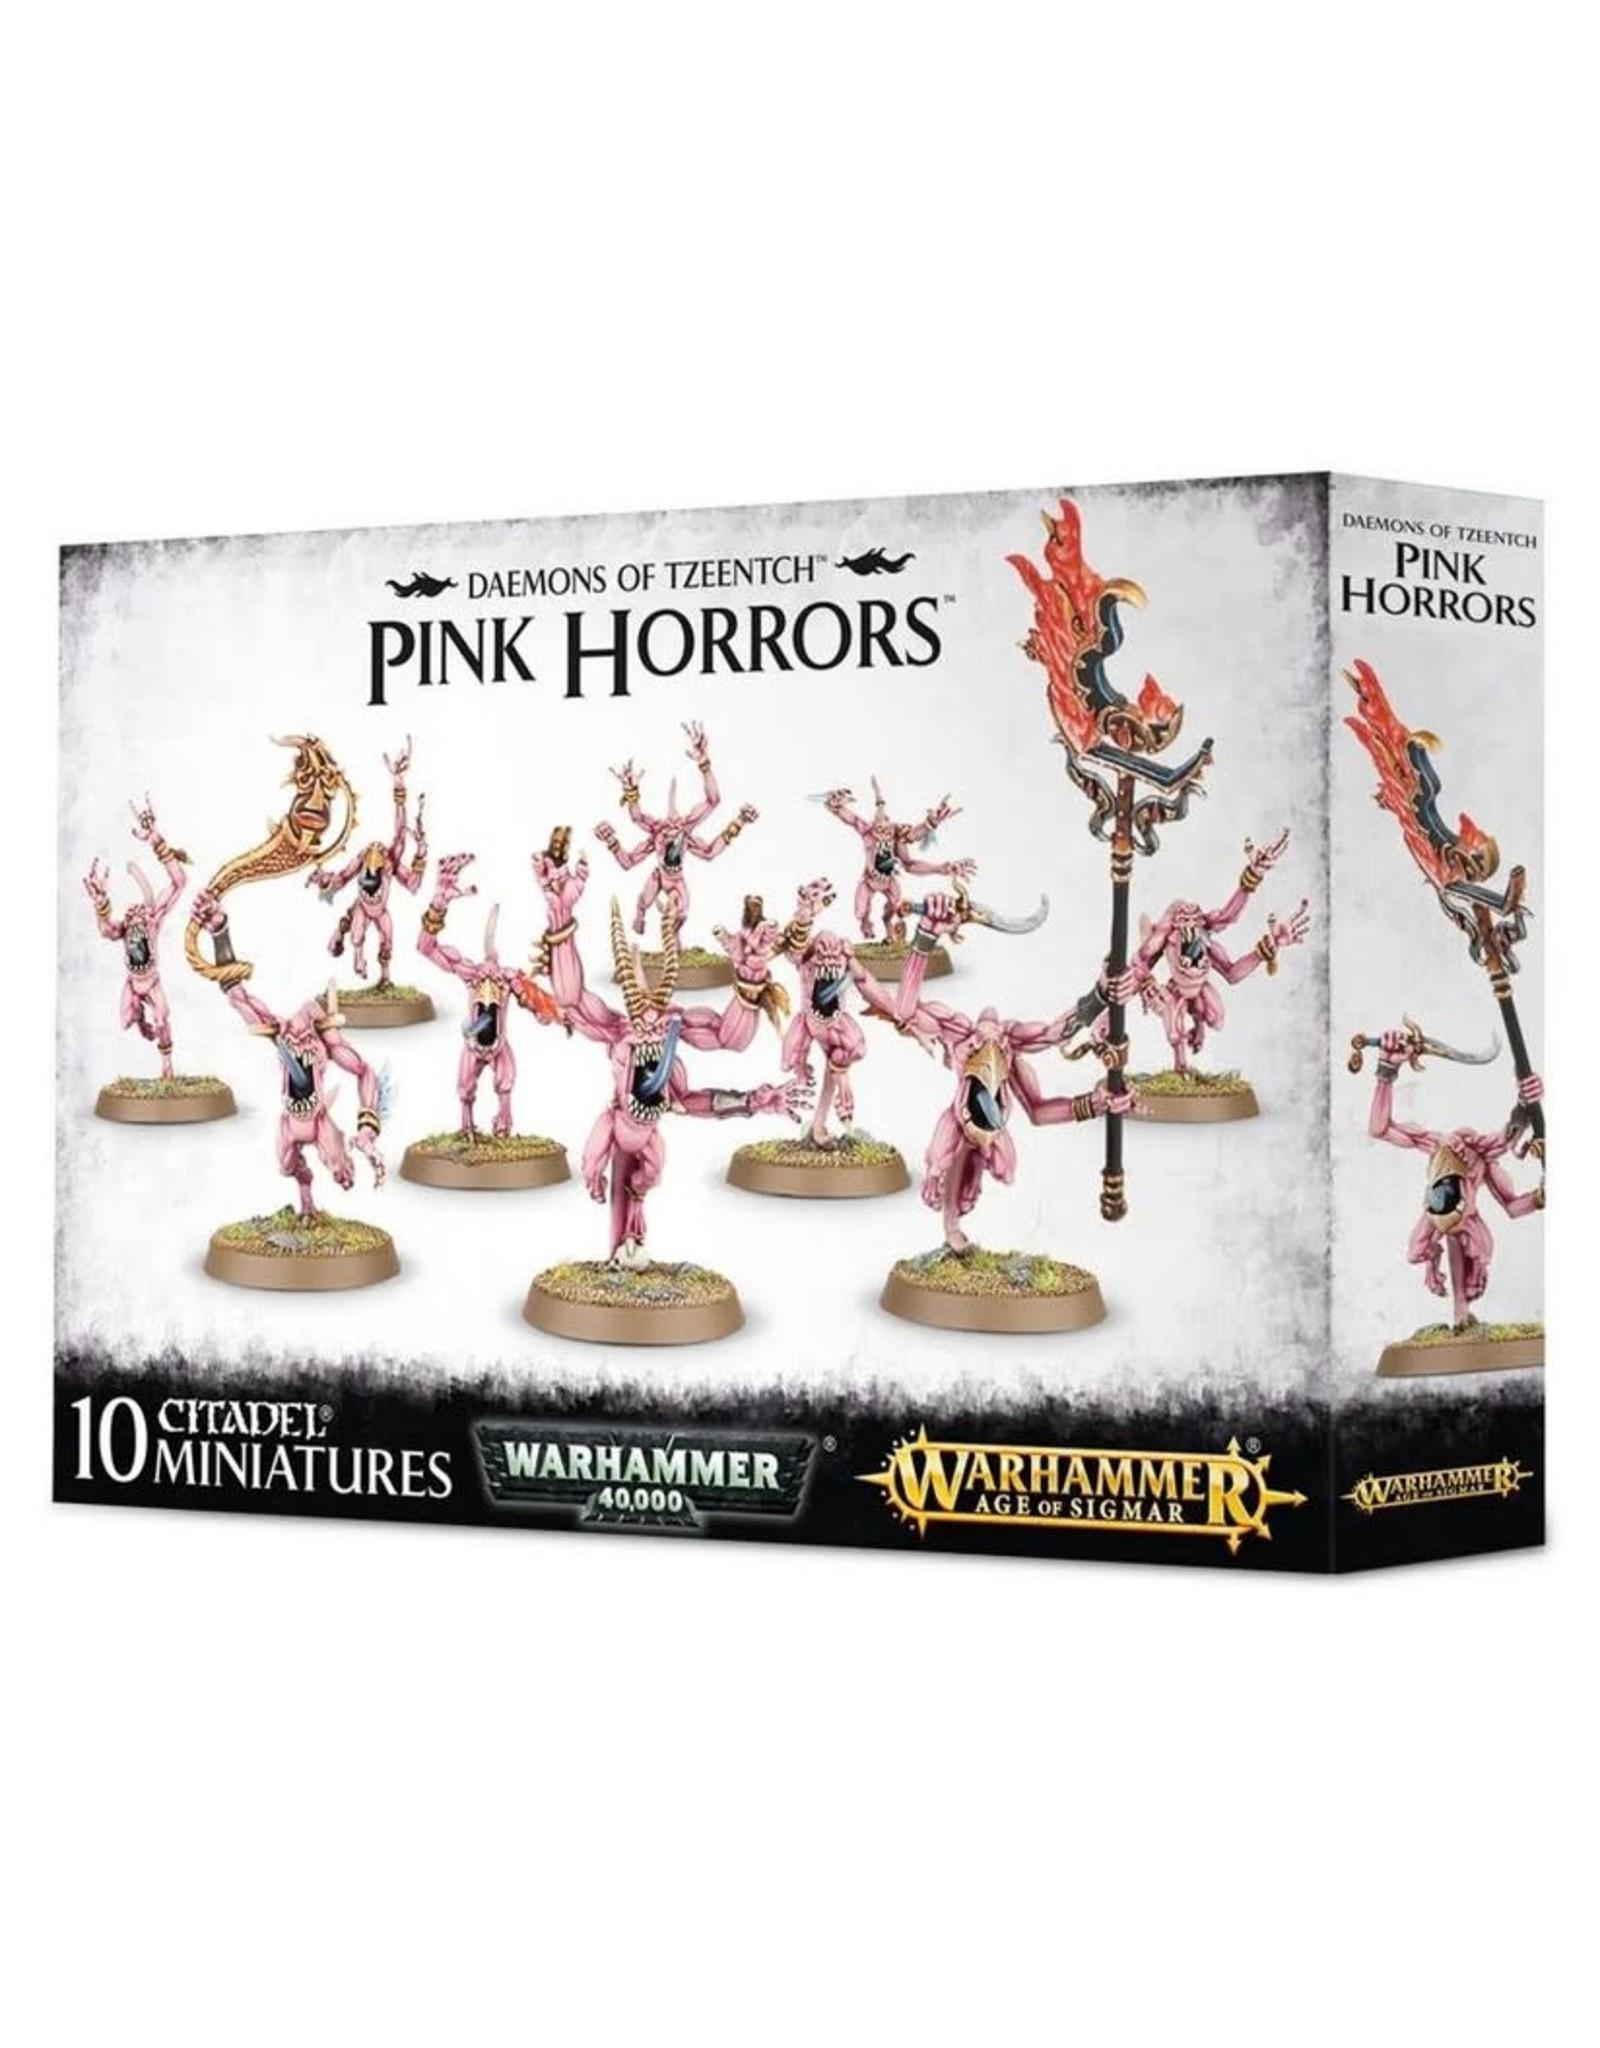 Warhammer AoS WHAoS Pink Horrors